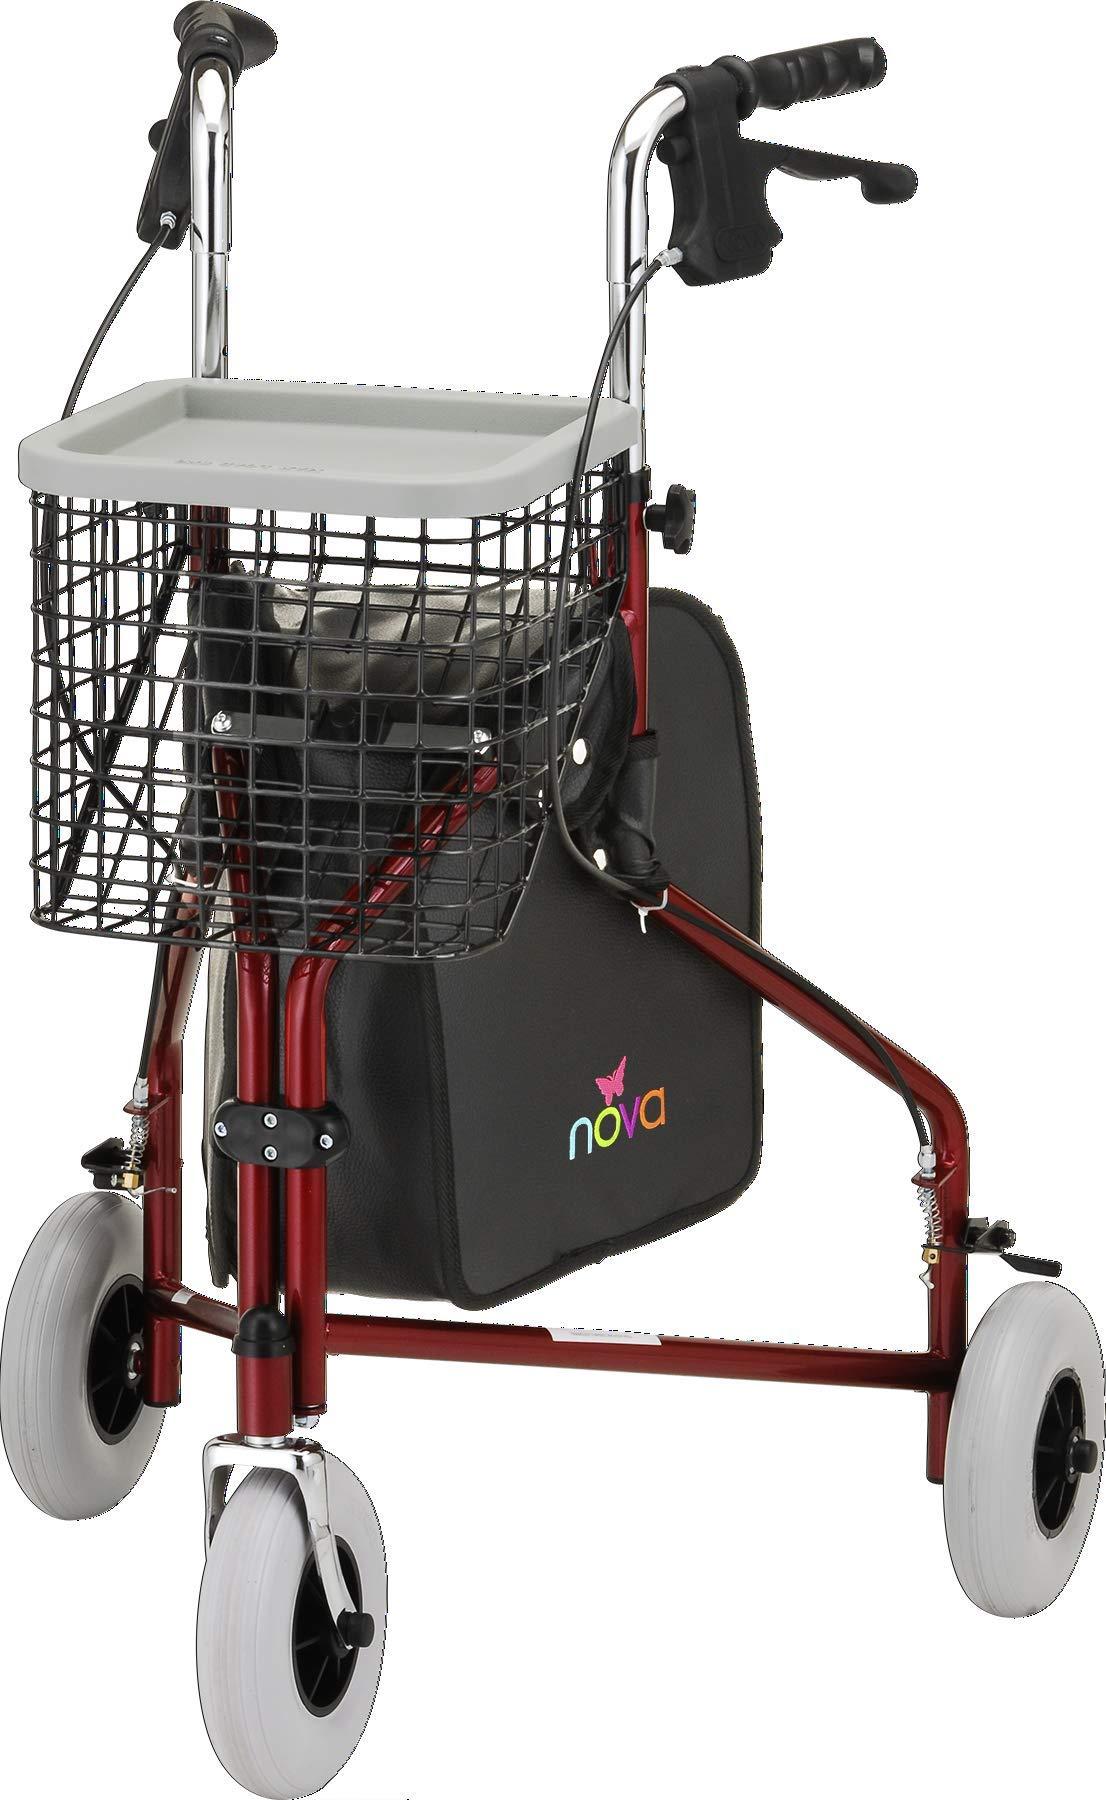 Amazon.com: NOVA Medical Products Traveler 3-Wheel Walker, Red: Health &  Personal Care